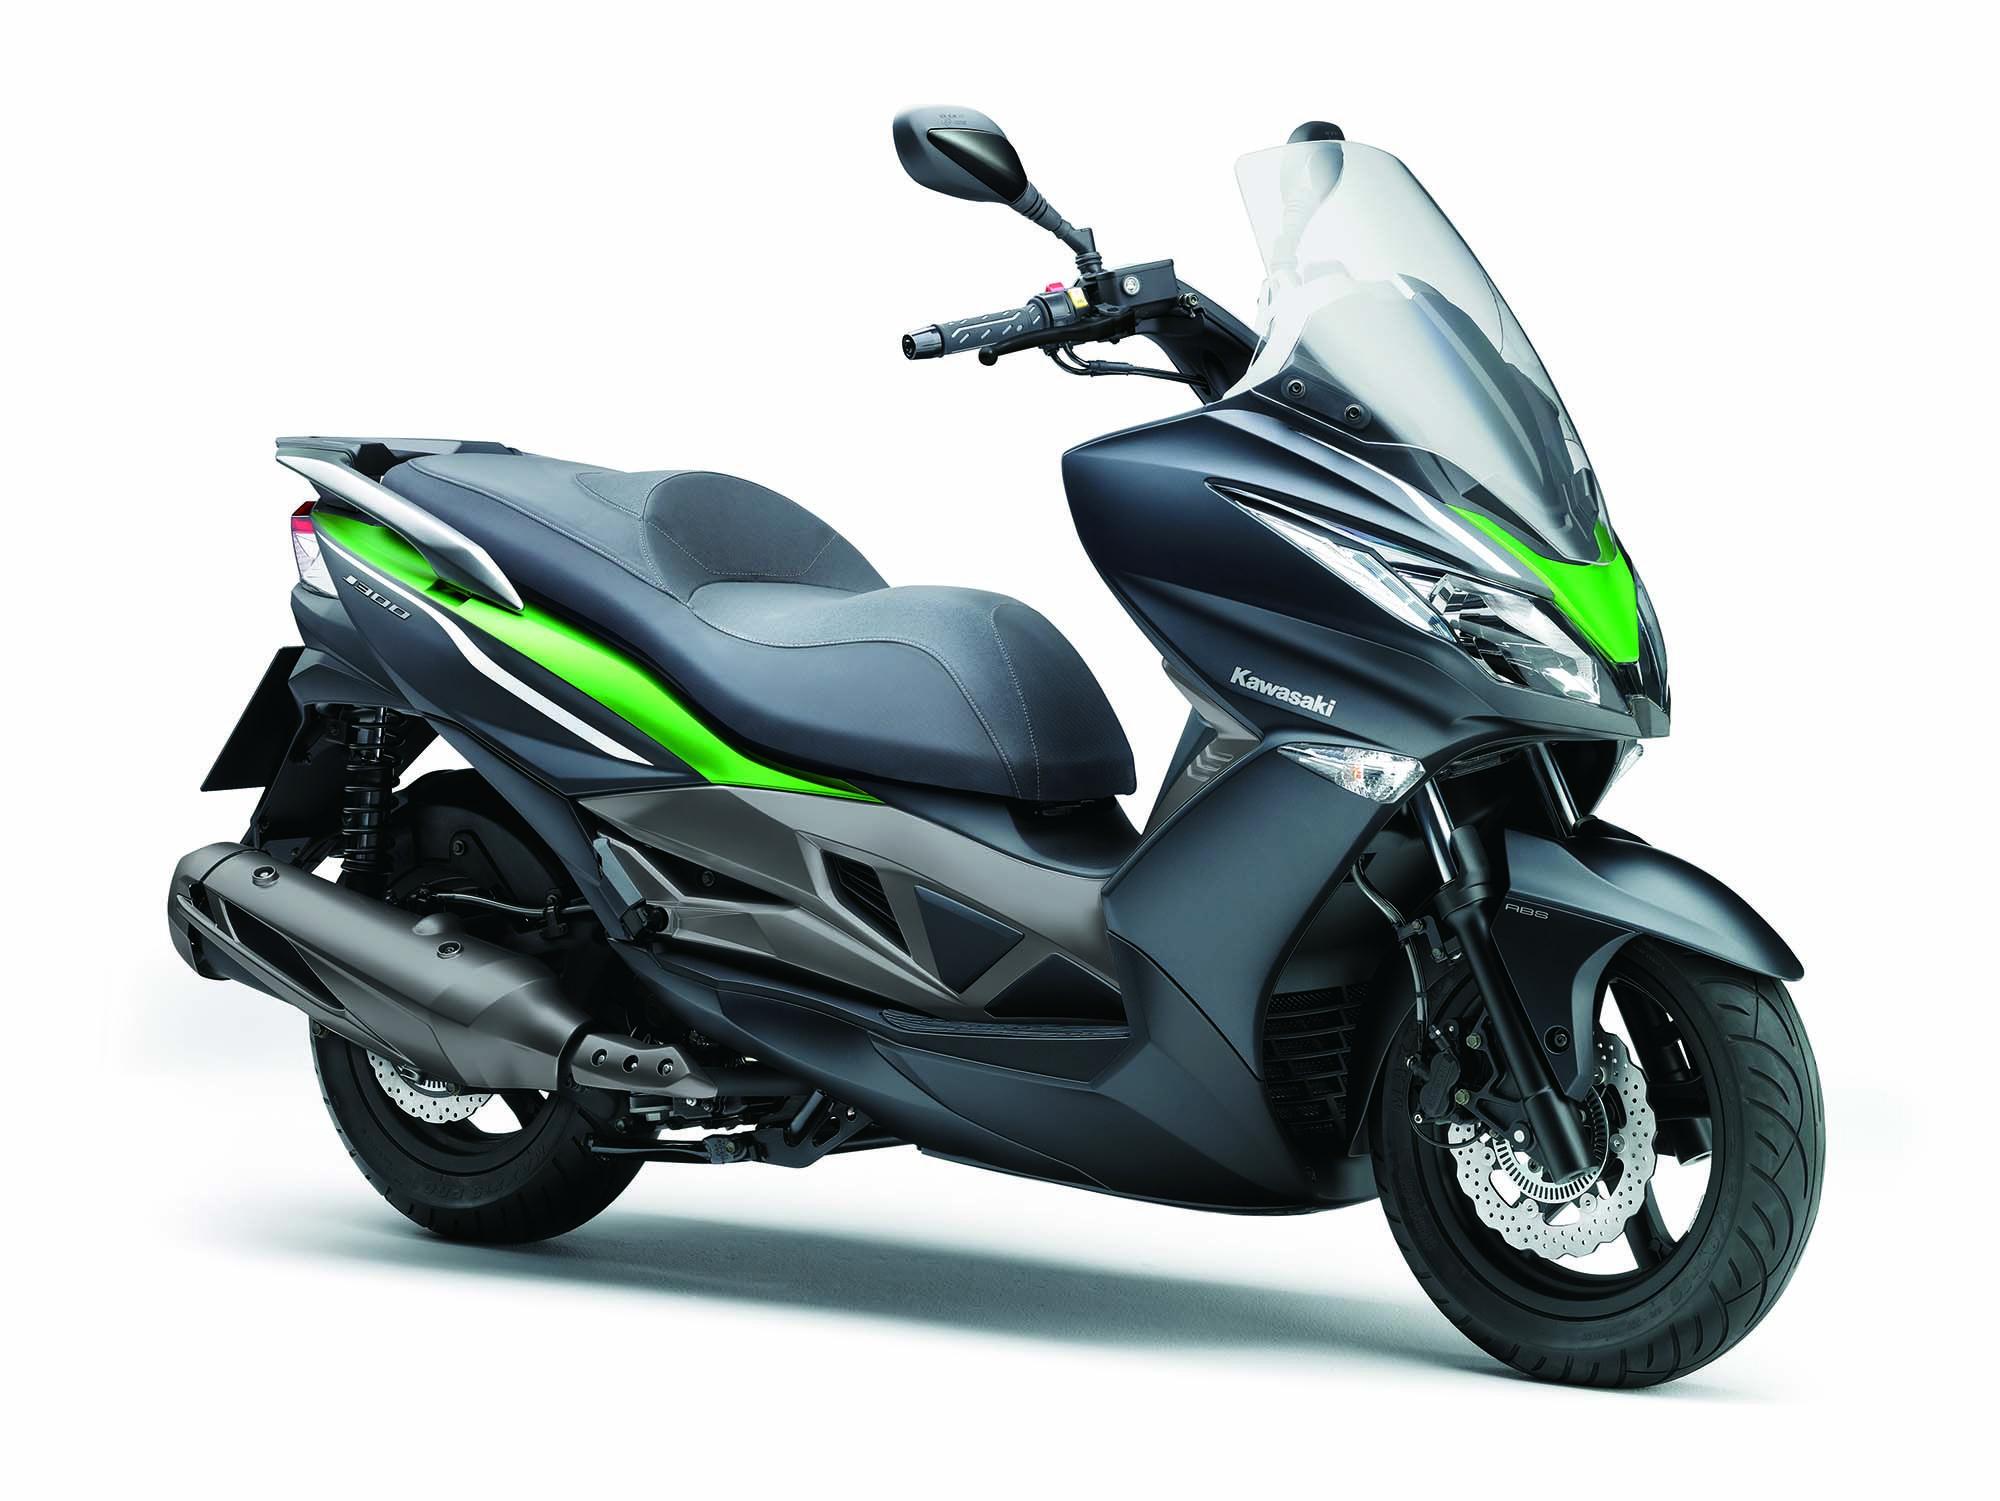 2014 Kawasaki J300 Scooter Motorcycles And Scooter Super Bikes